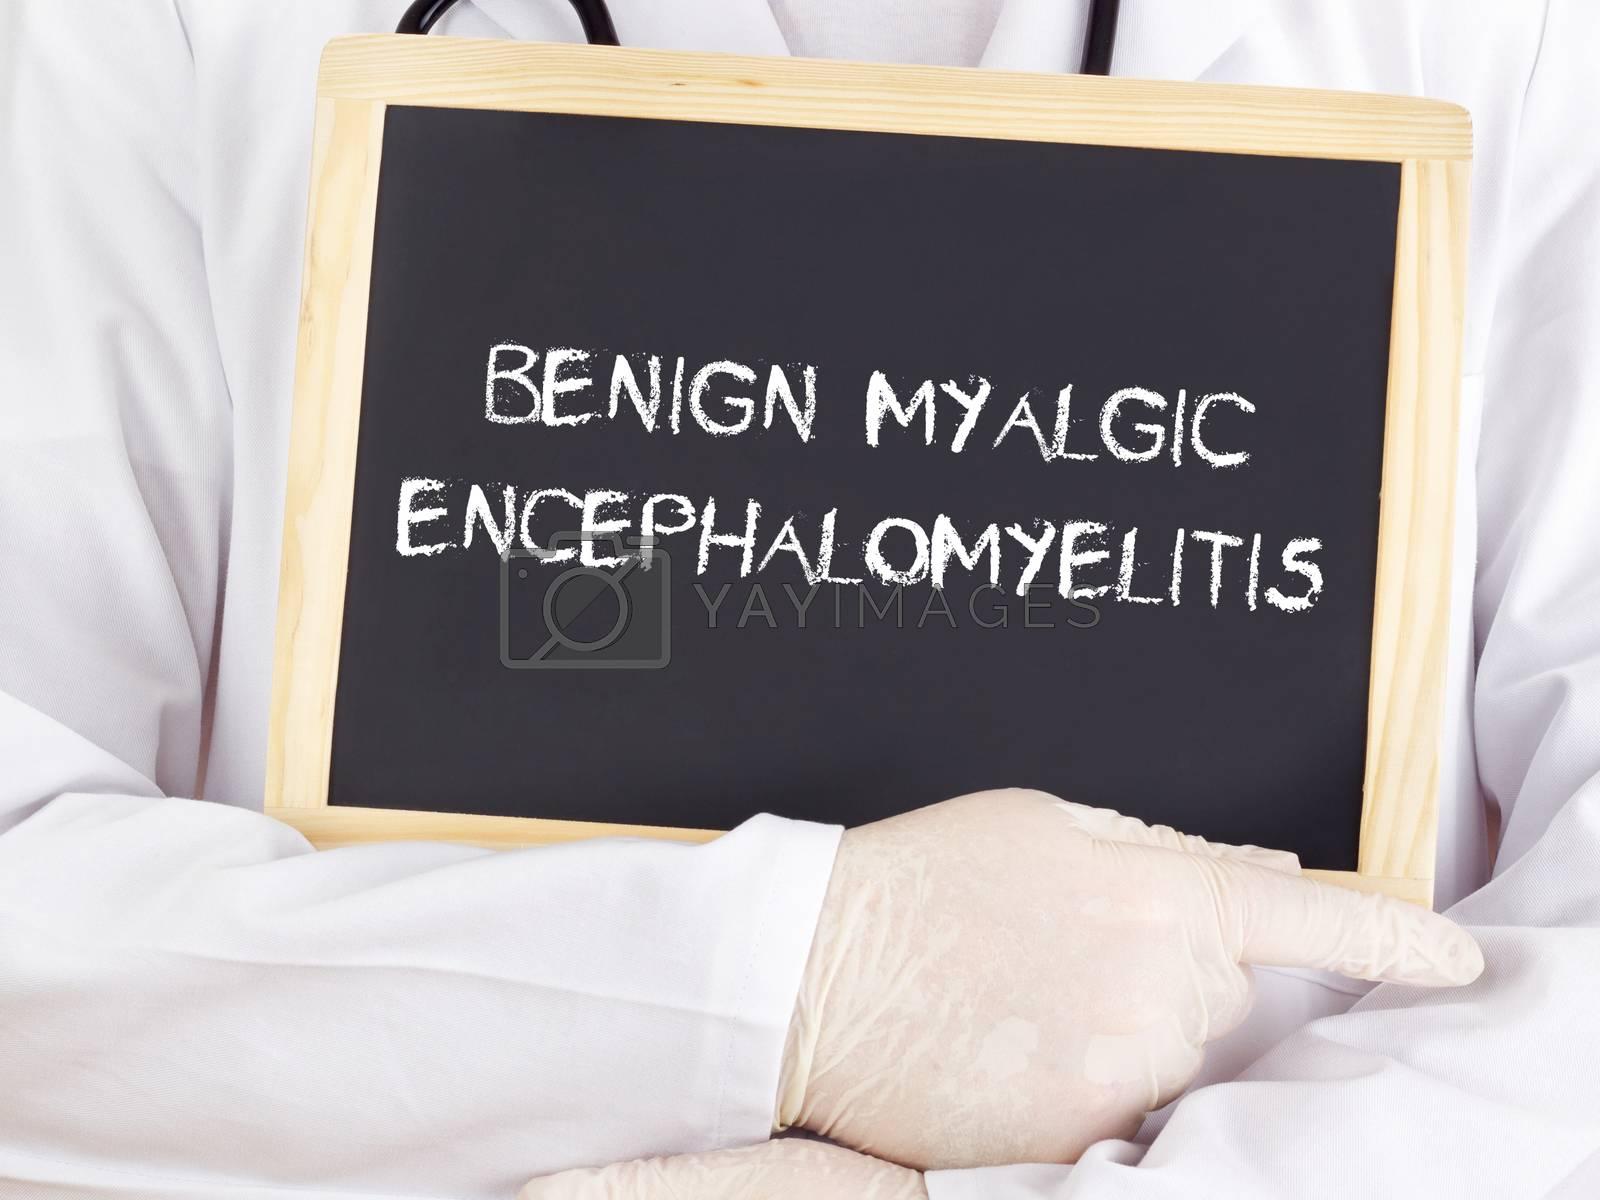 Royalty free image of Doctor shows information: benign myalgic encephalomyelitis by gwolters